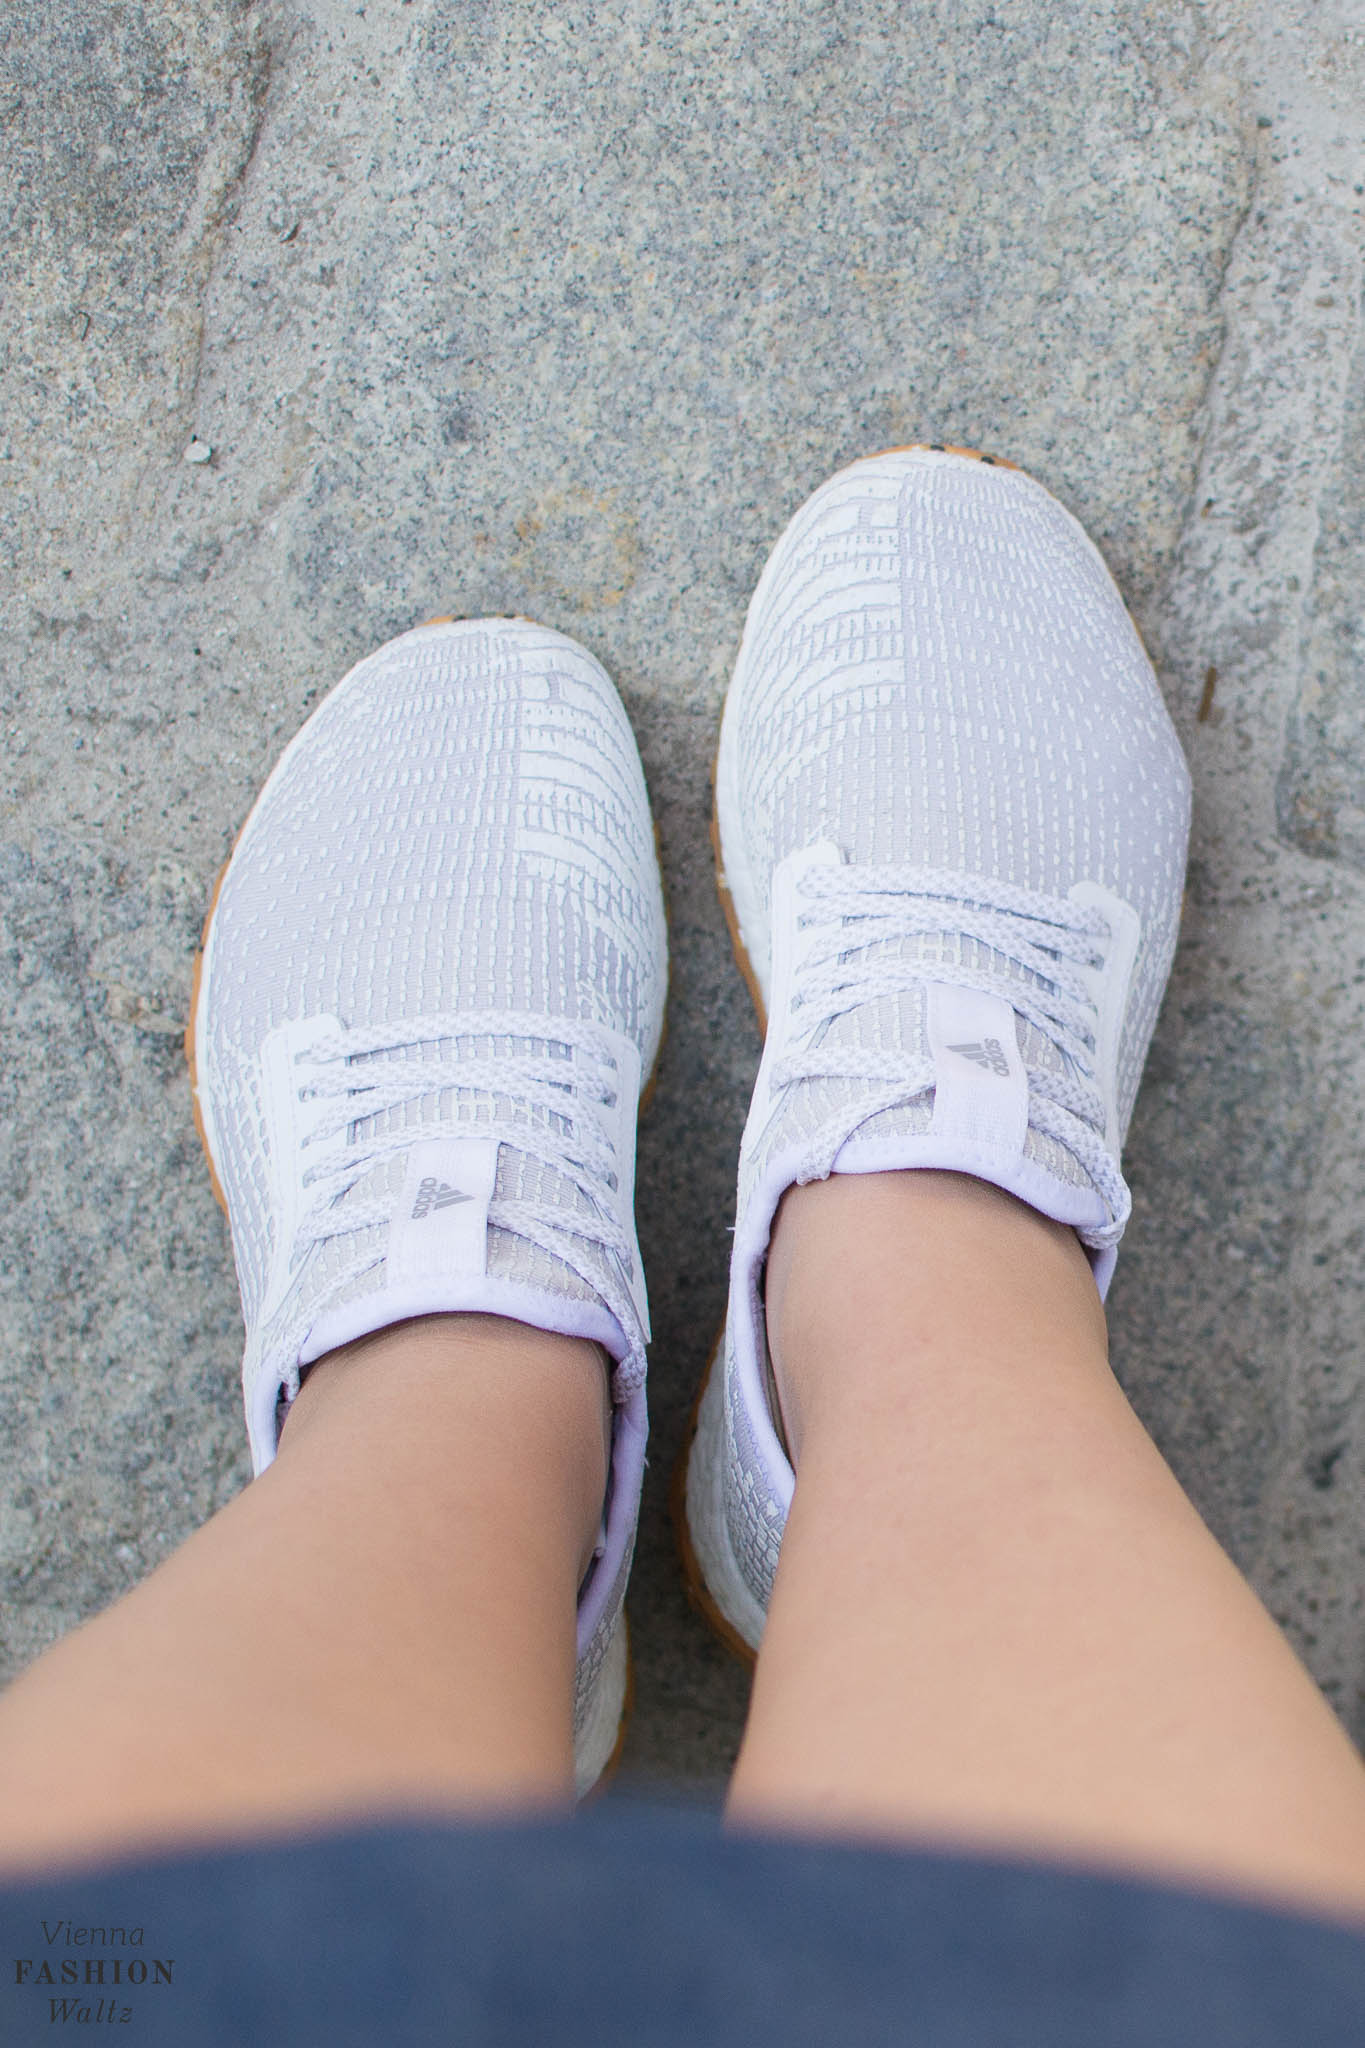 Adidas Pure Boost ATR